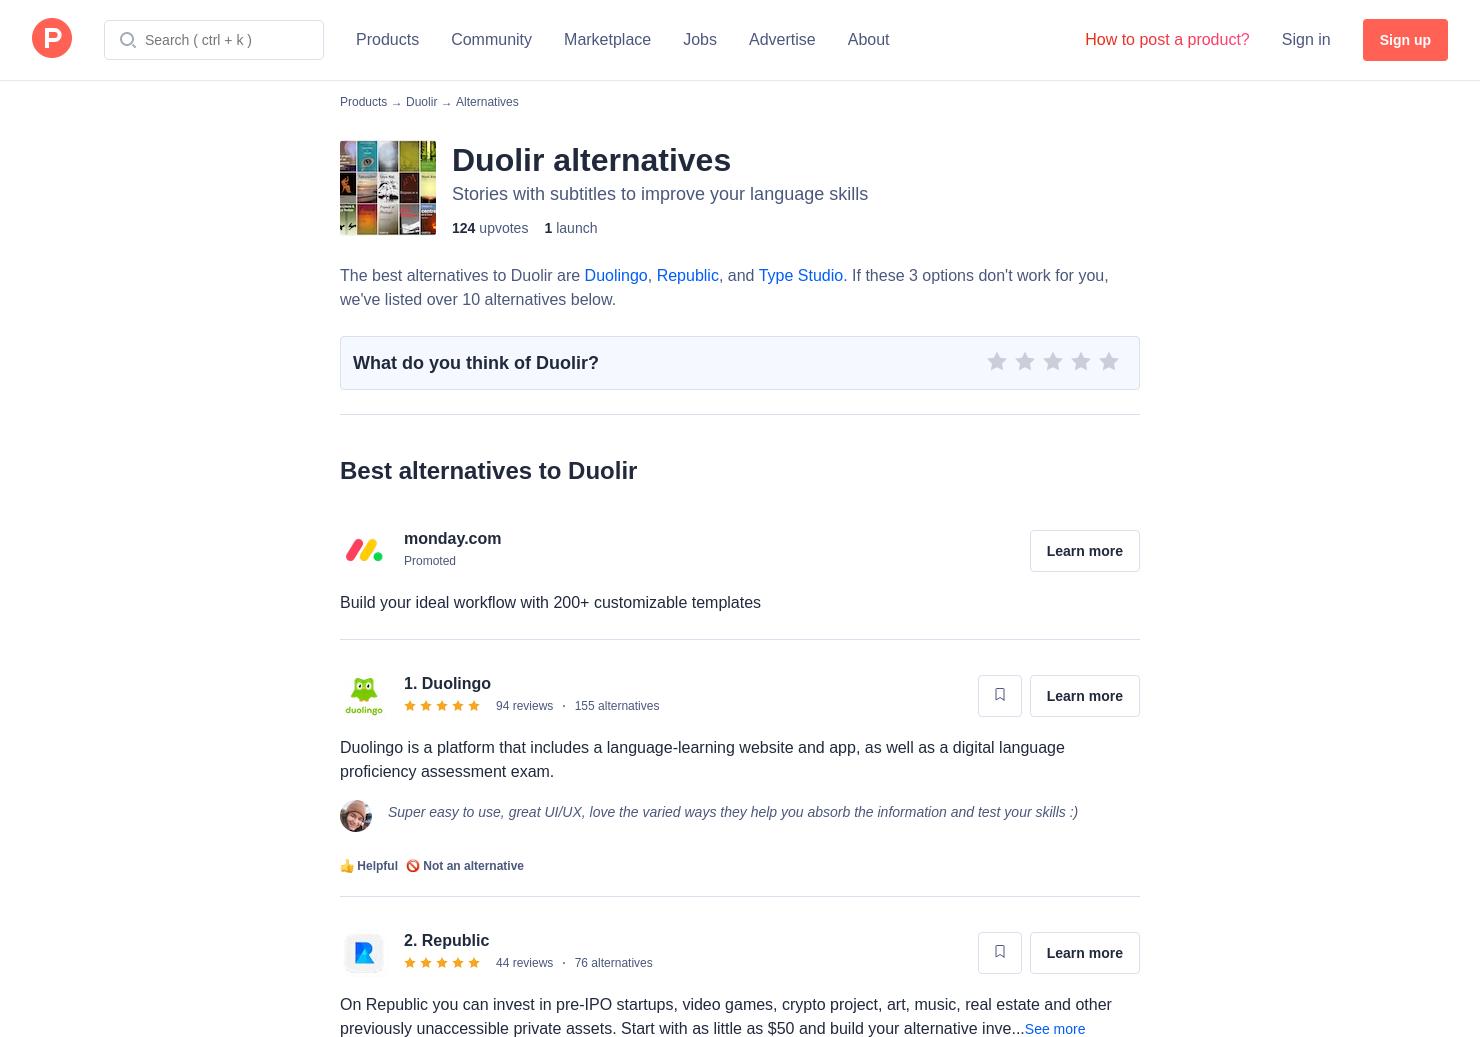 25 Alternatives to Duolir   Product Hunt